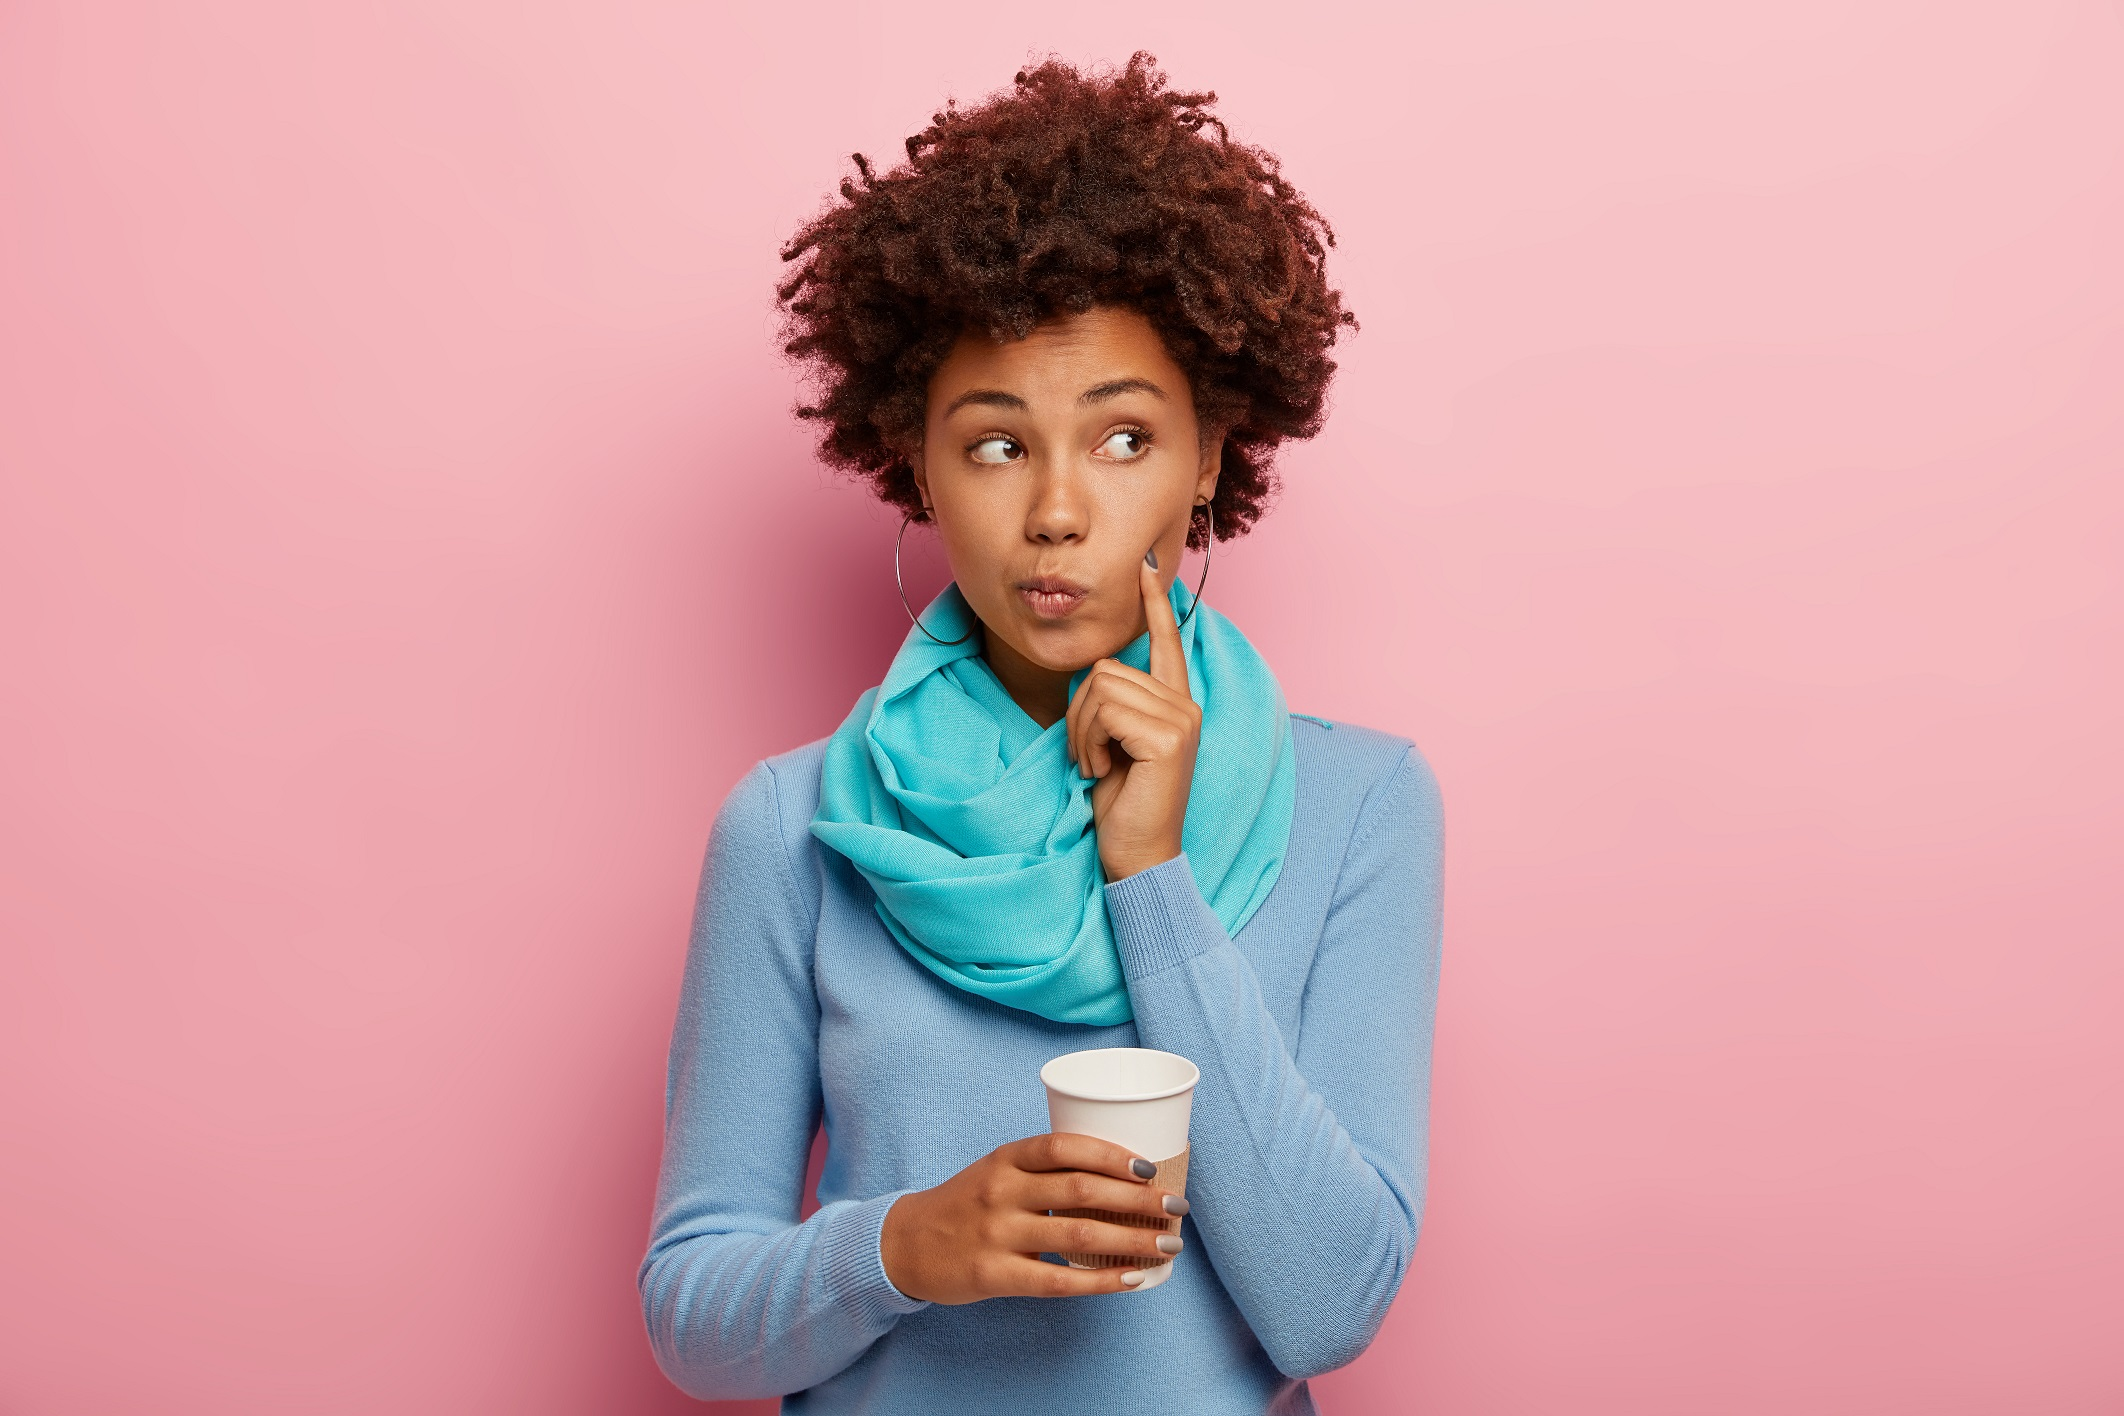 premenstrual syndrome, PMS, PMS symptoms, Premenstrual Dysphoric Disorder, PMDD, severe PMS, bloating before period, PMS treatment, breast pain before period, PMS moodswings, moodiness before period